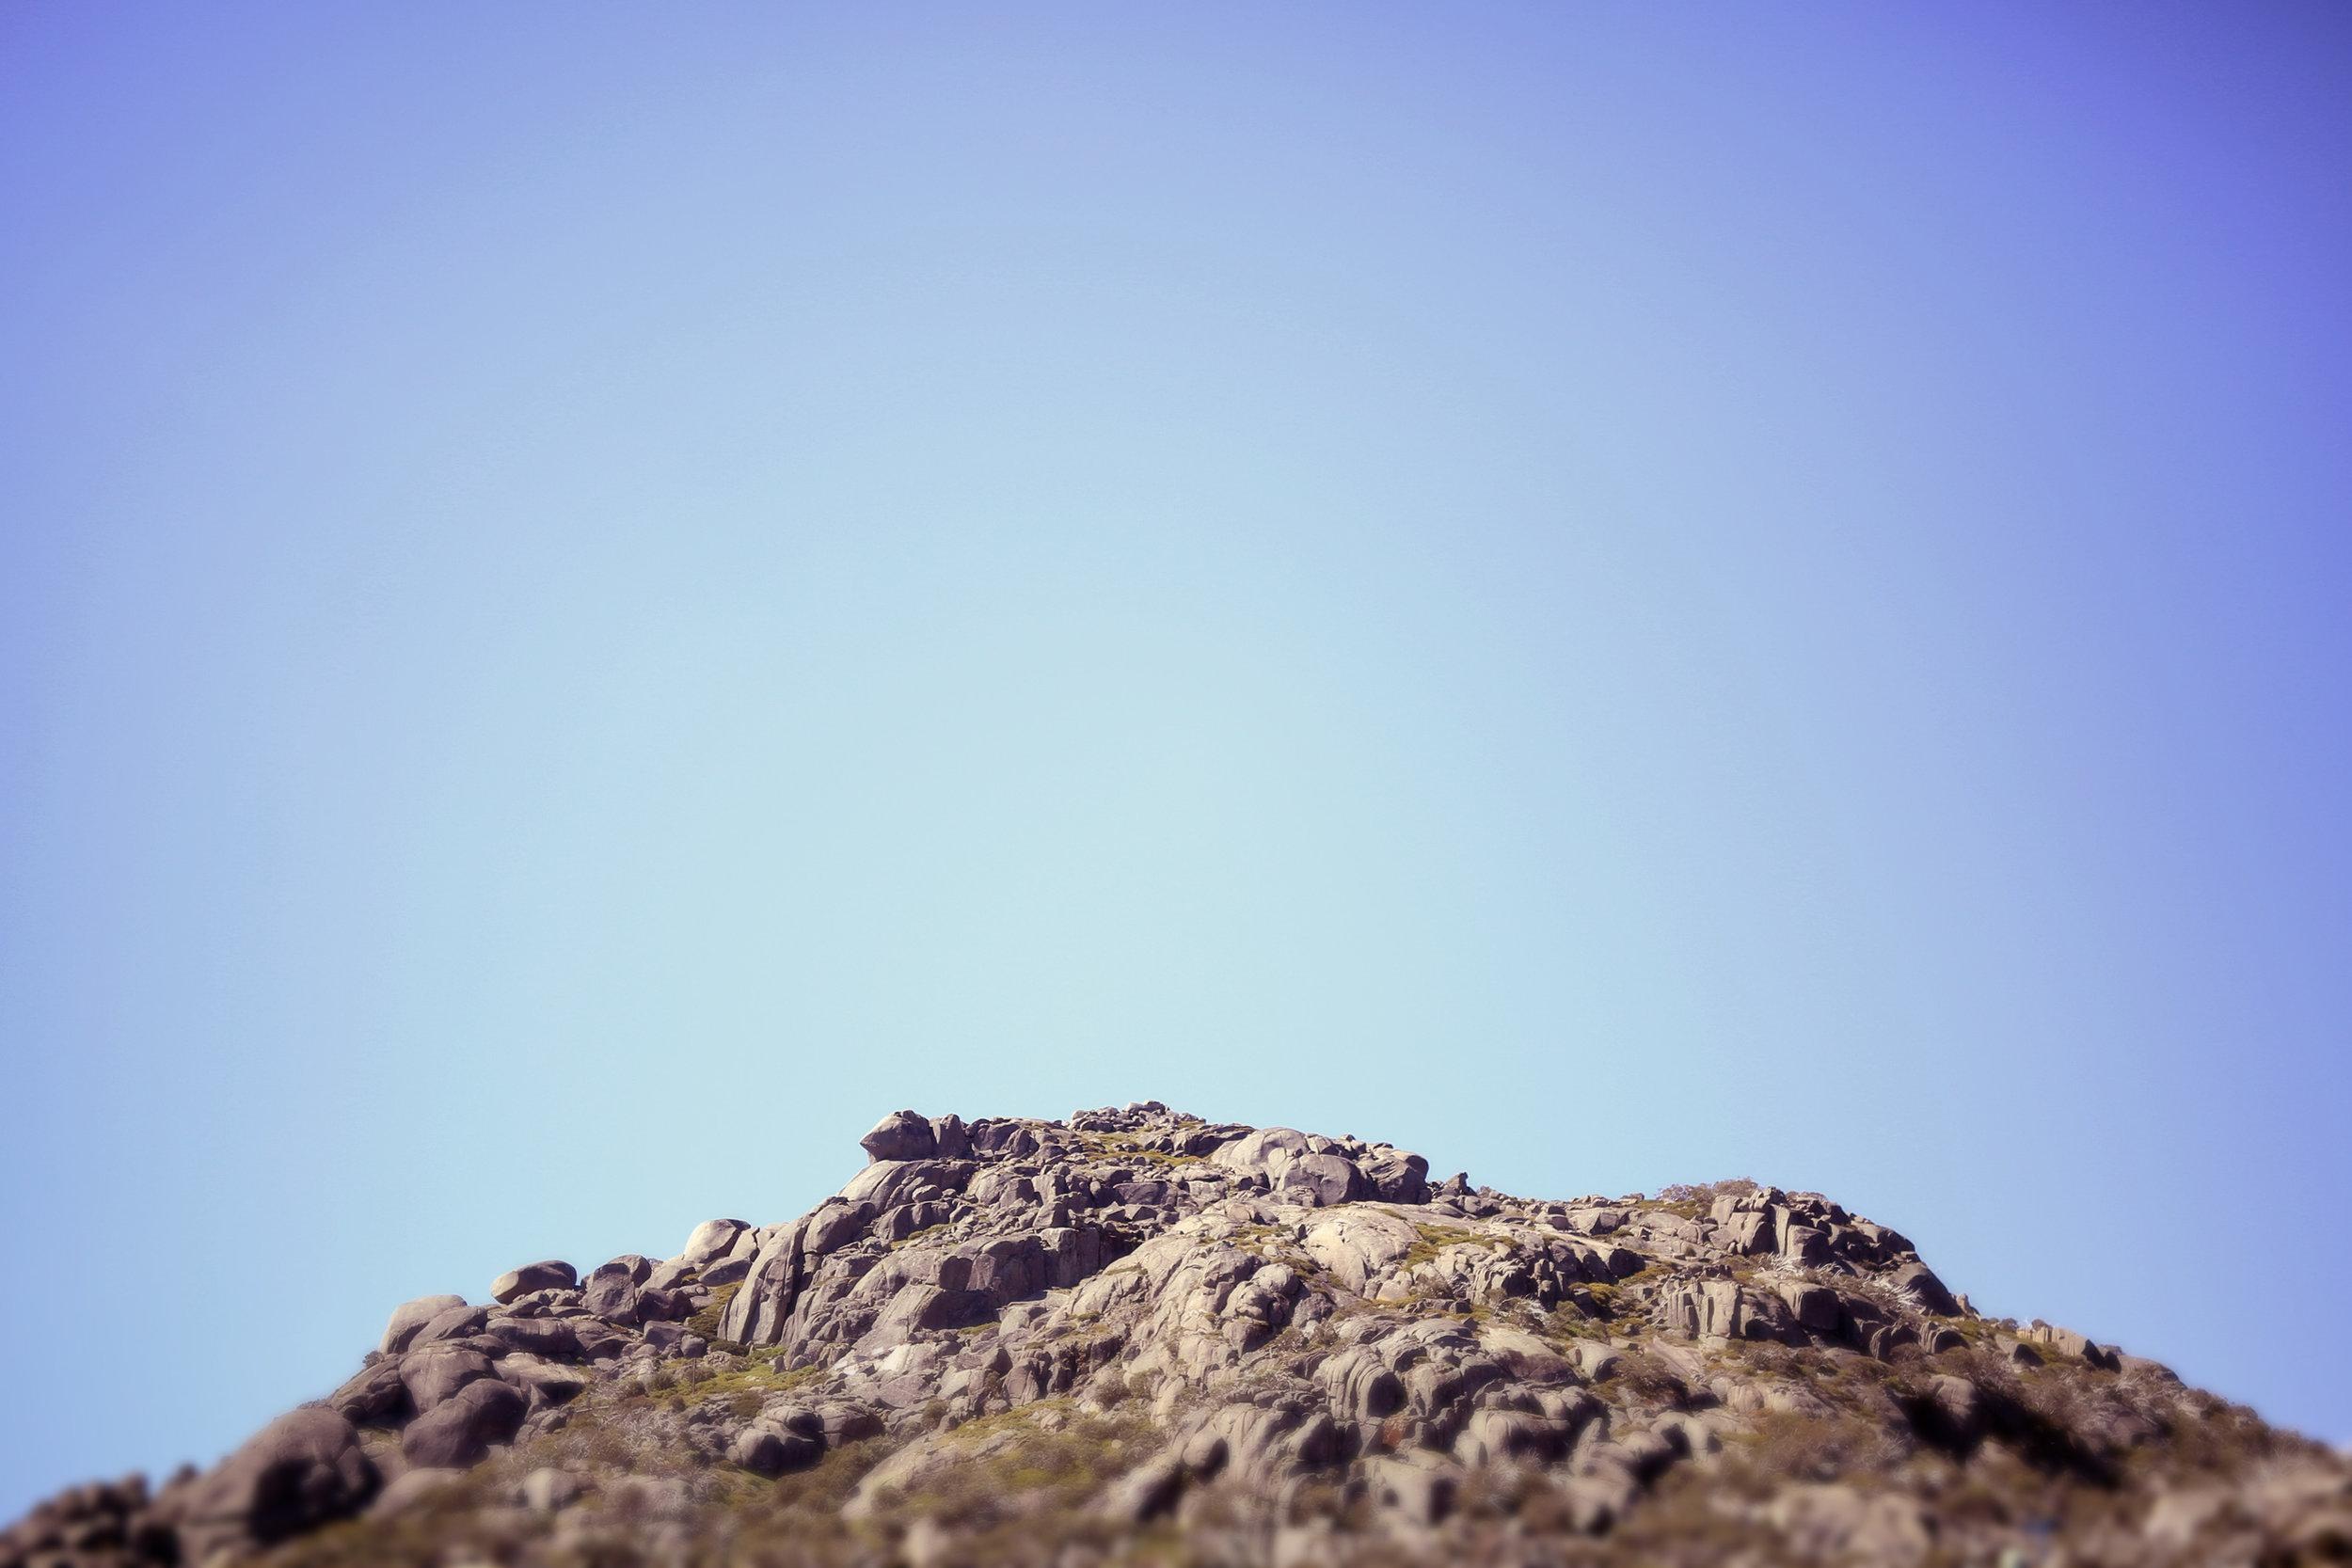 kristin-wursthorn-landscape-photography-art-melbourne-5.jpg